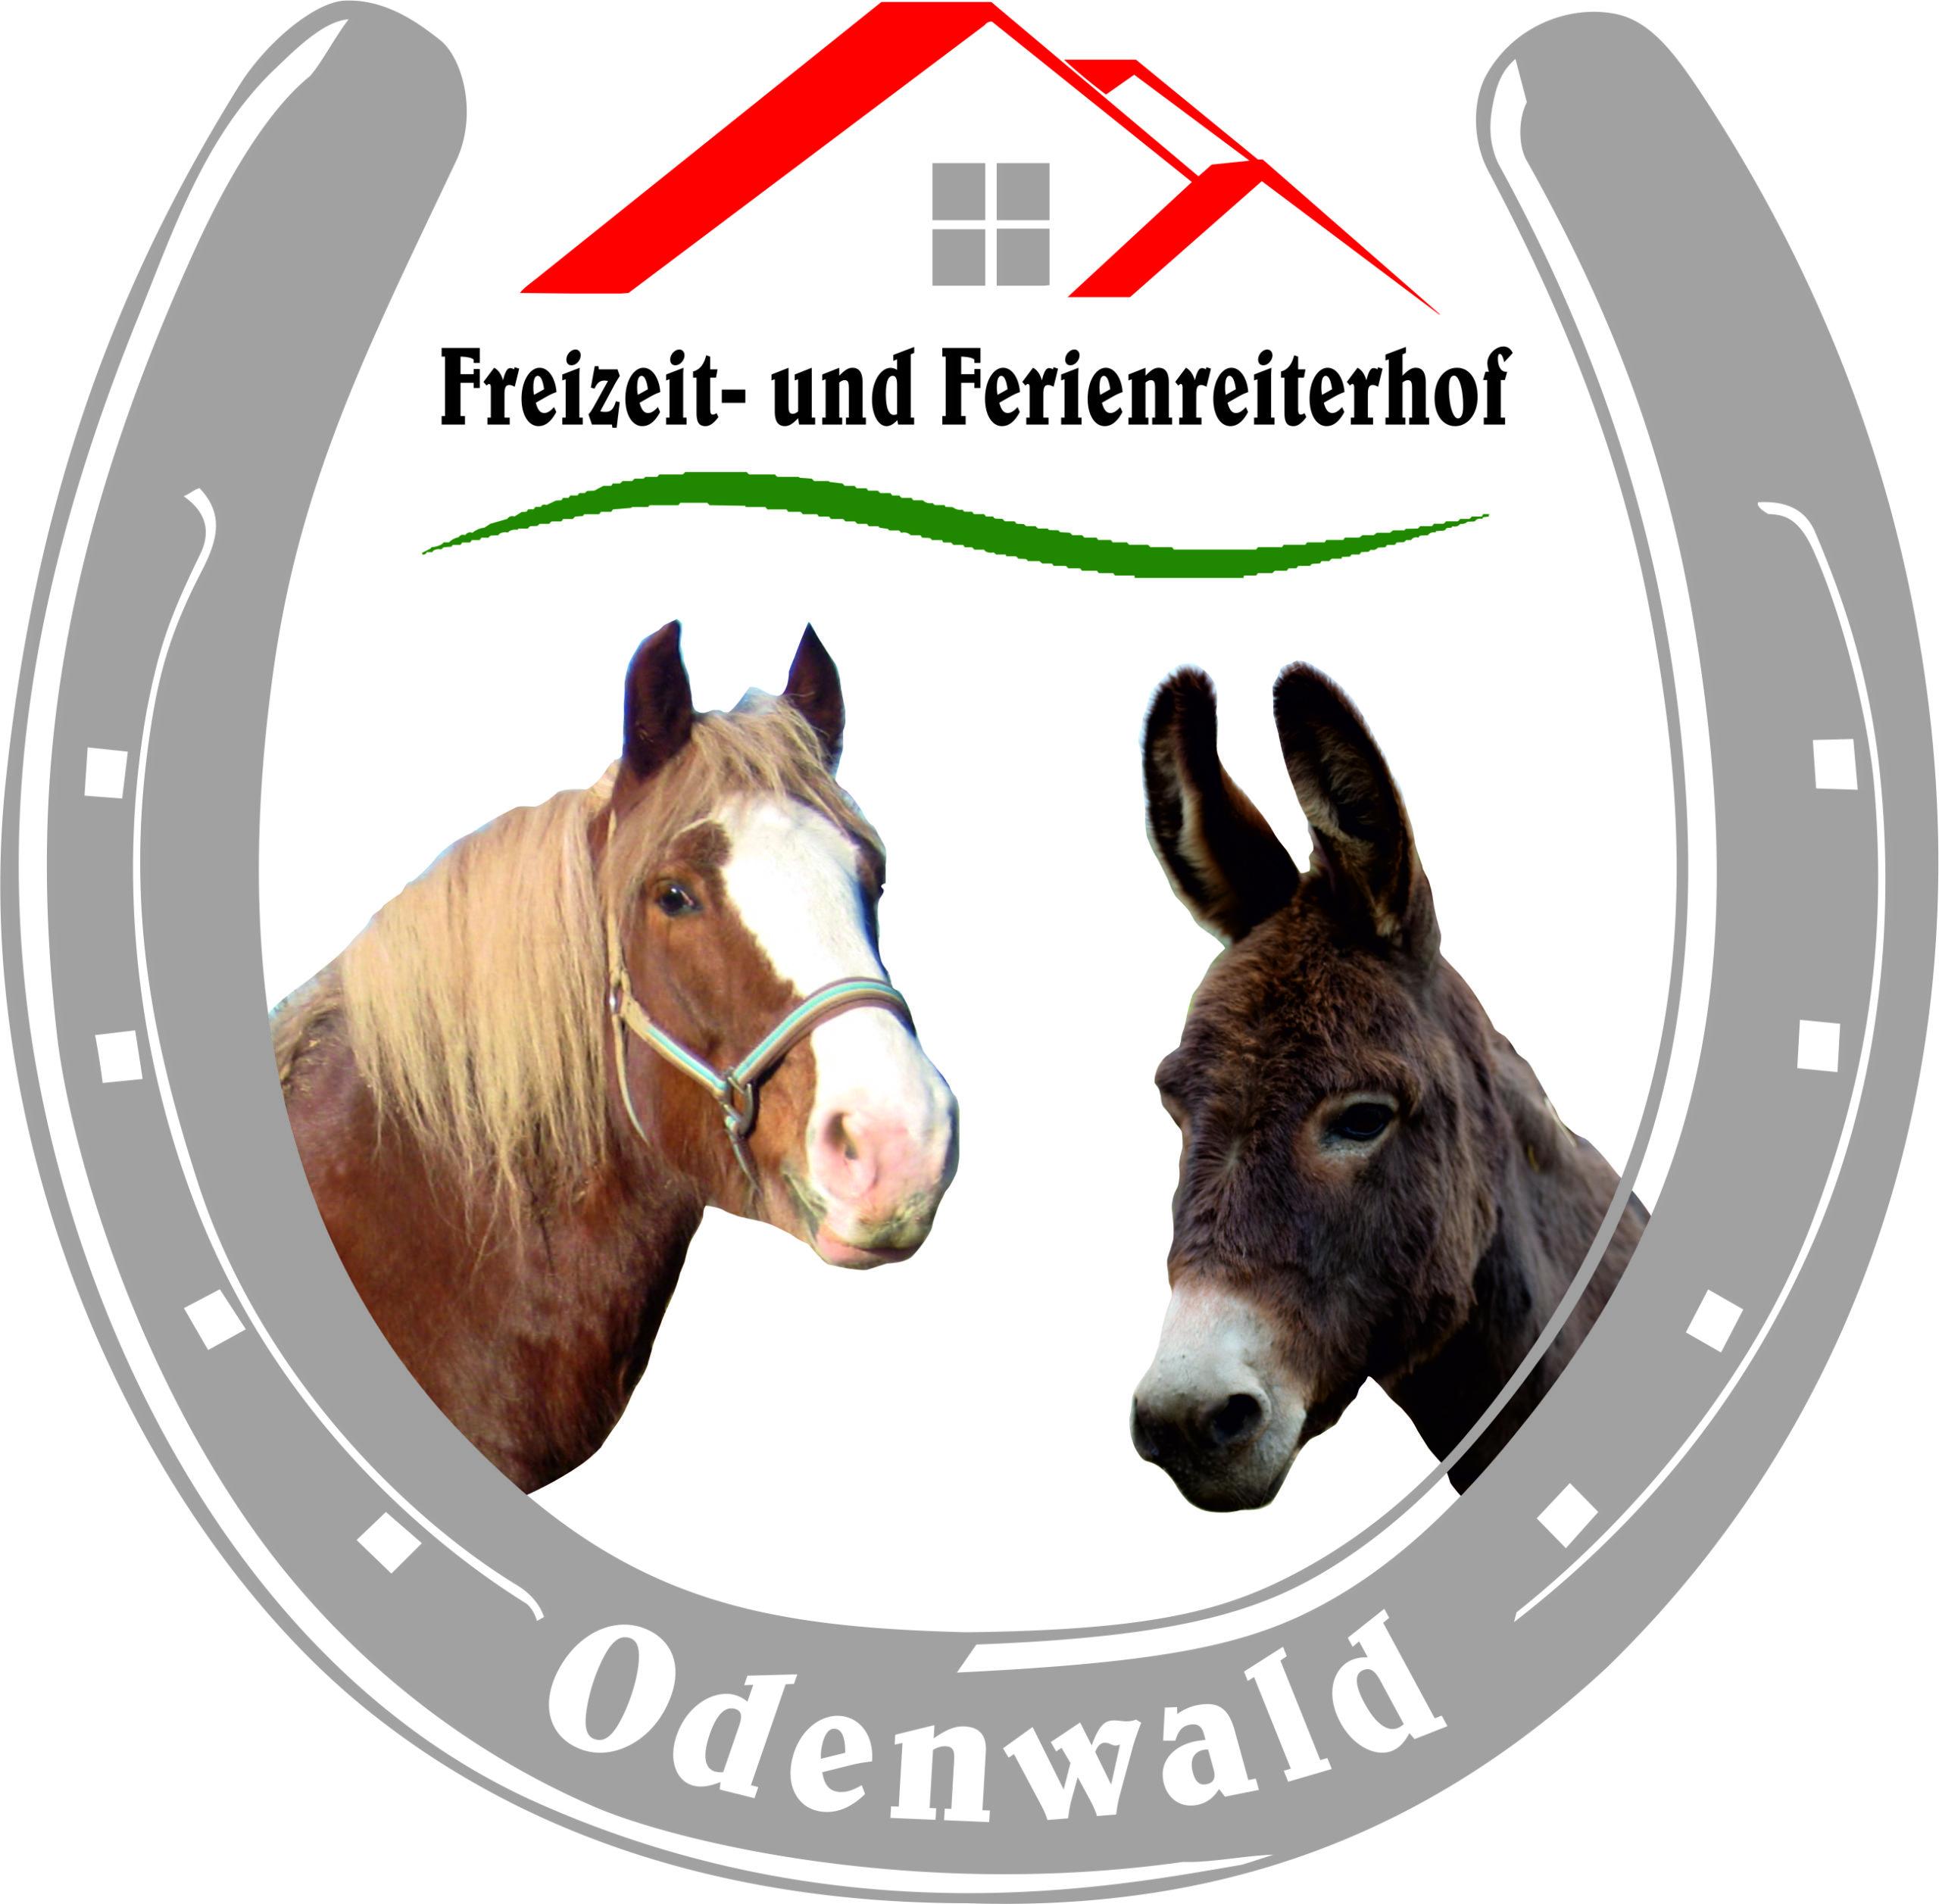 odenwald-urlaub.de